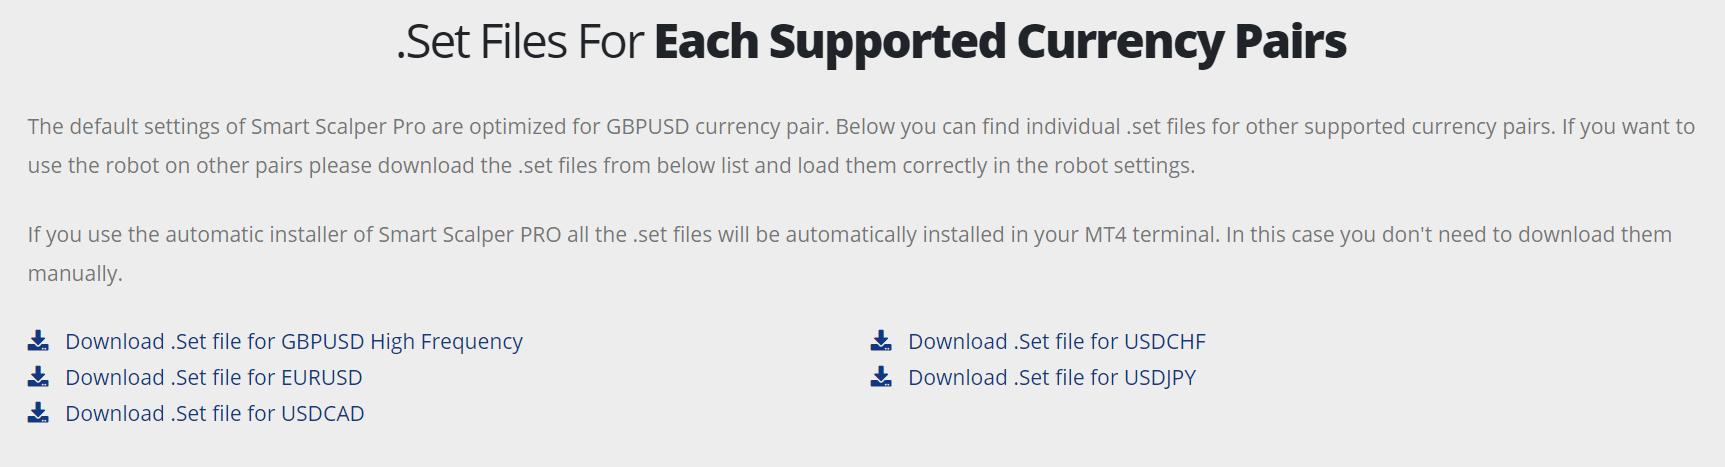 Set files for Smart Scalper Pro